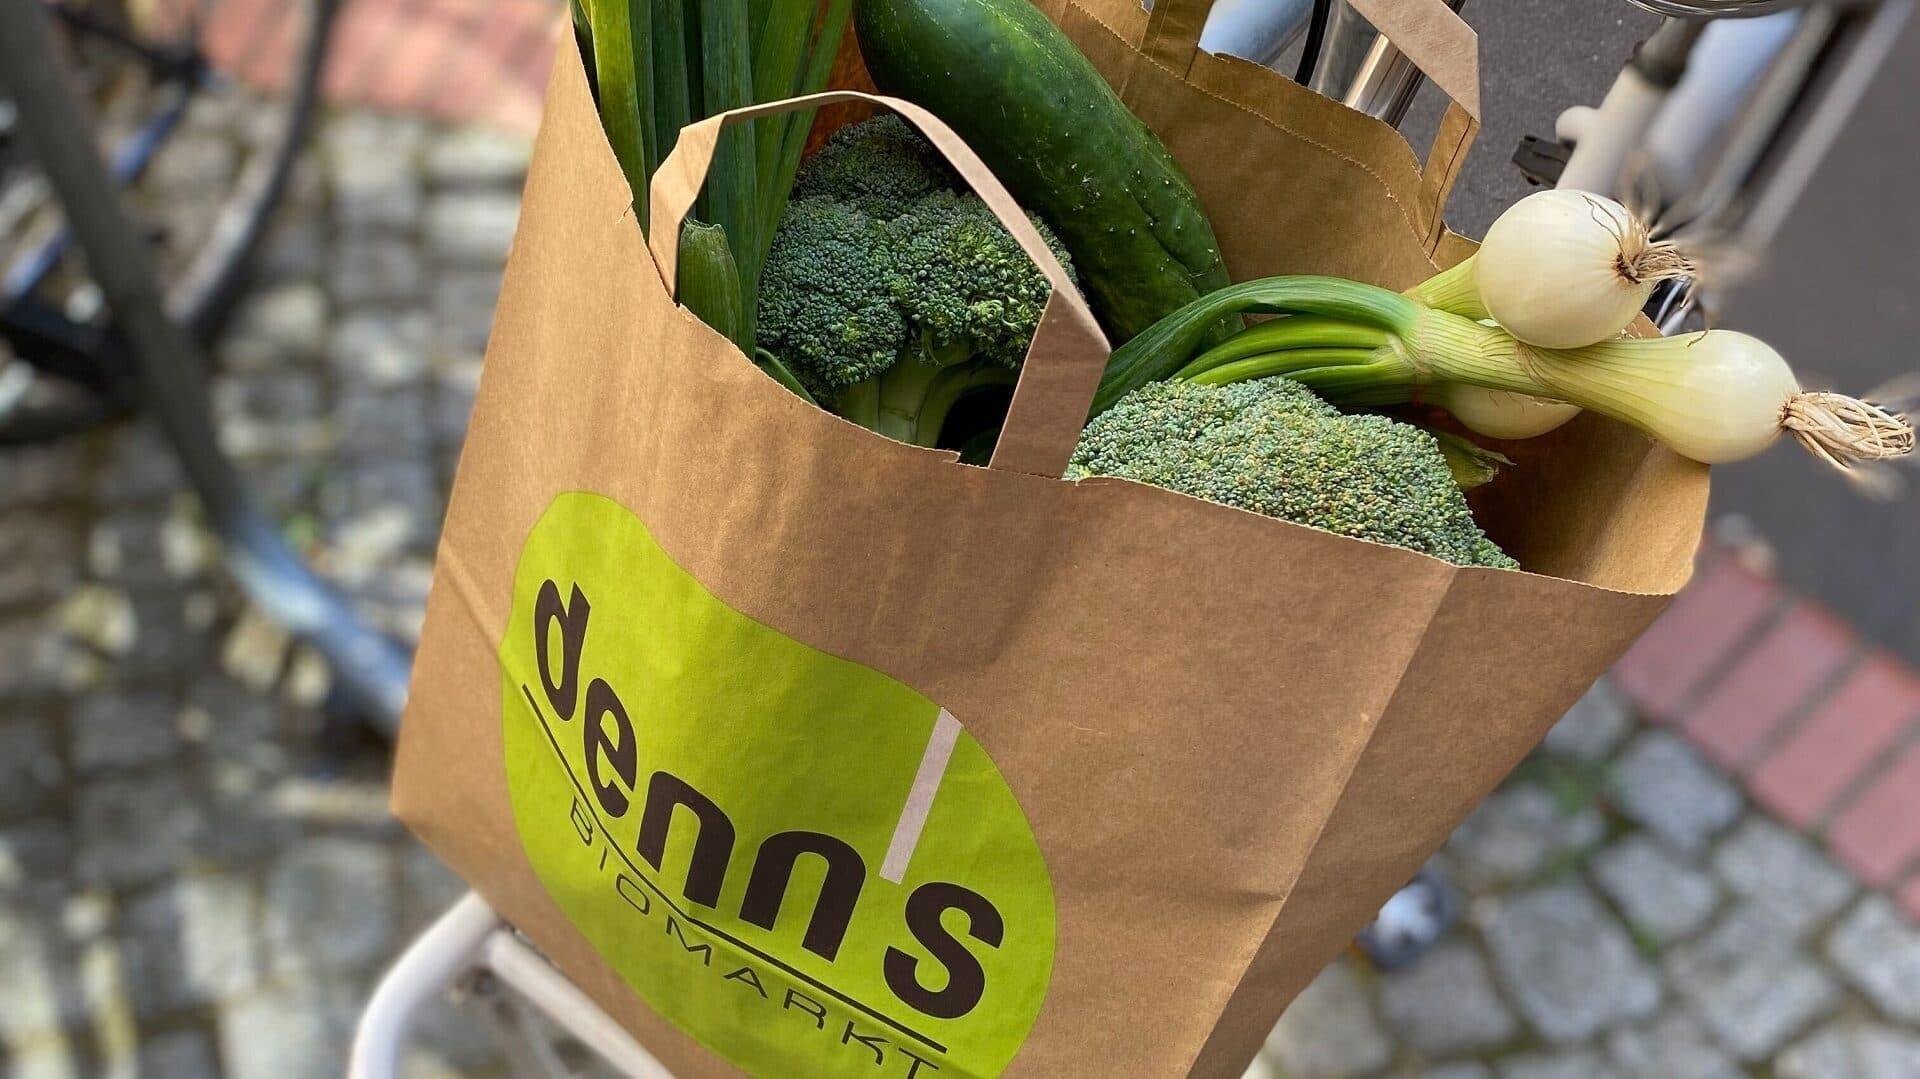 Denn's-Tüte mit geretteten Lebensmitteln